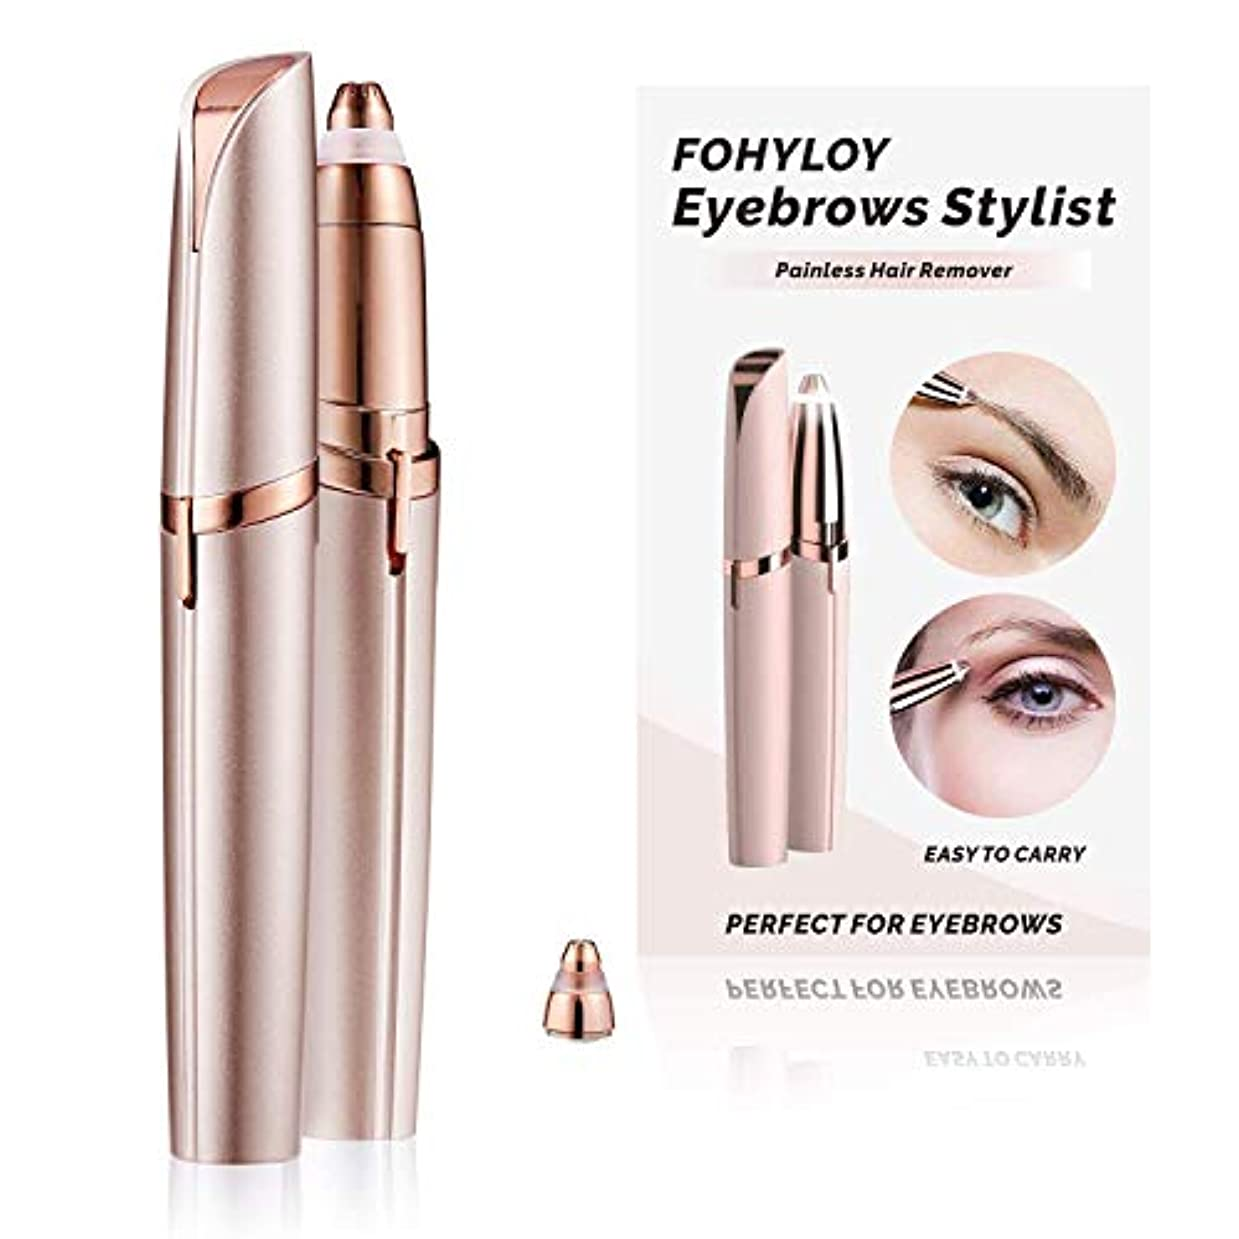 MQQ 電気痛みのない眉毛の取り外し装置、眉毛のトリマーのかみそりの女性の眉毛の取り外し装置